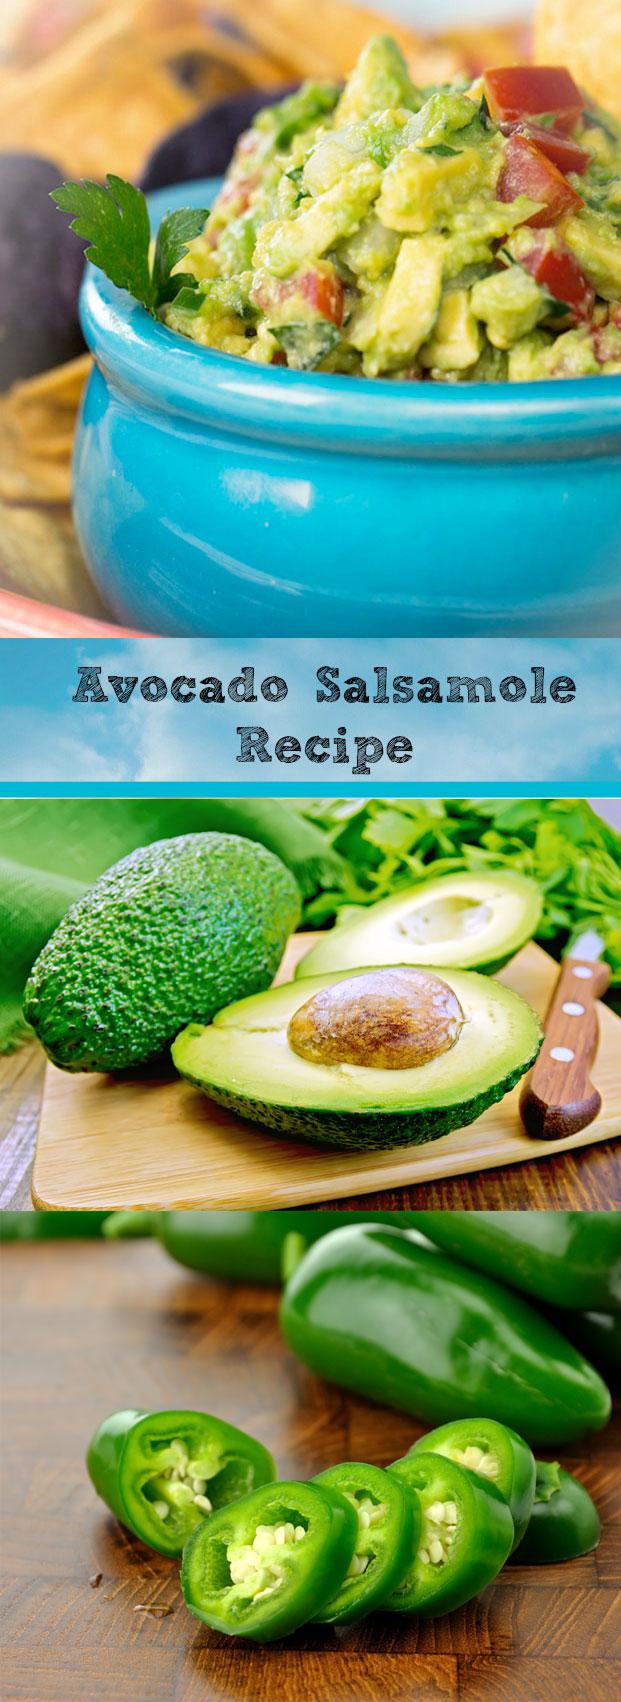 Guacamole Recipe : Avocado Salsamole Recipe